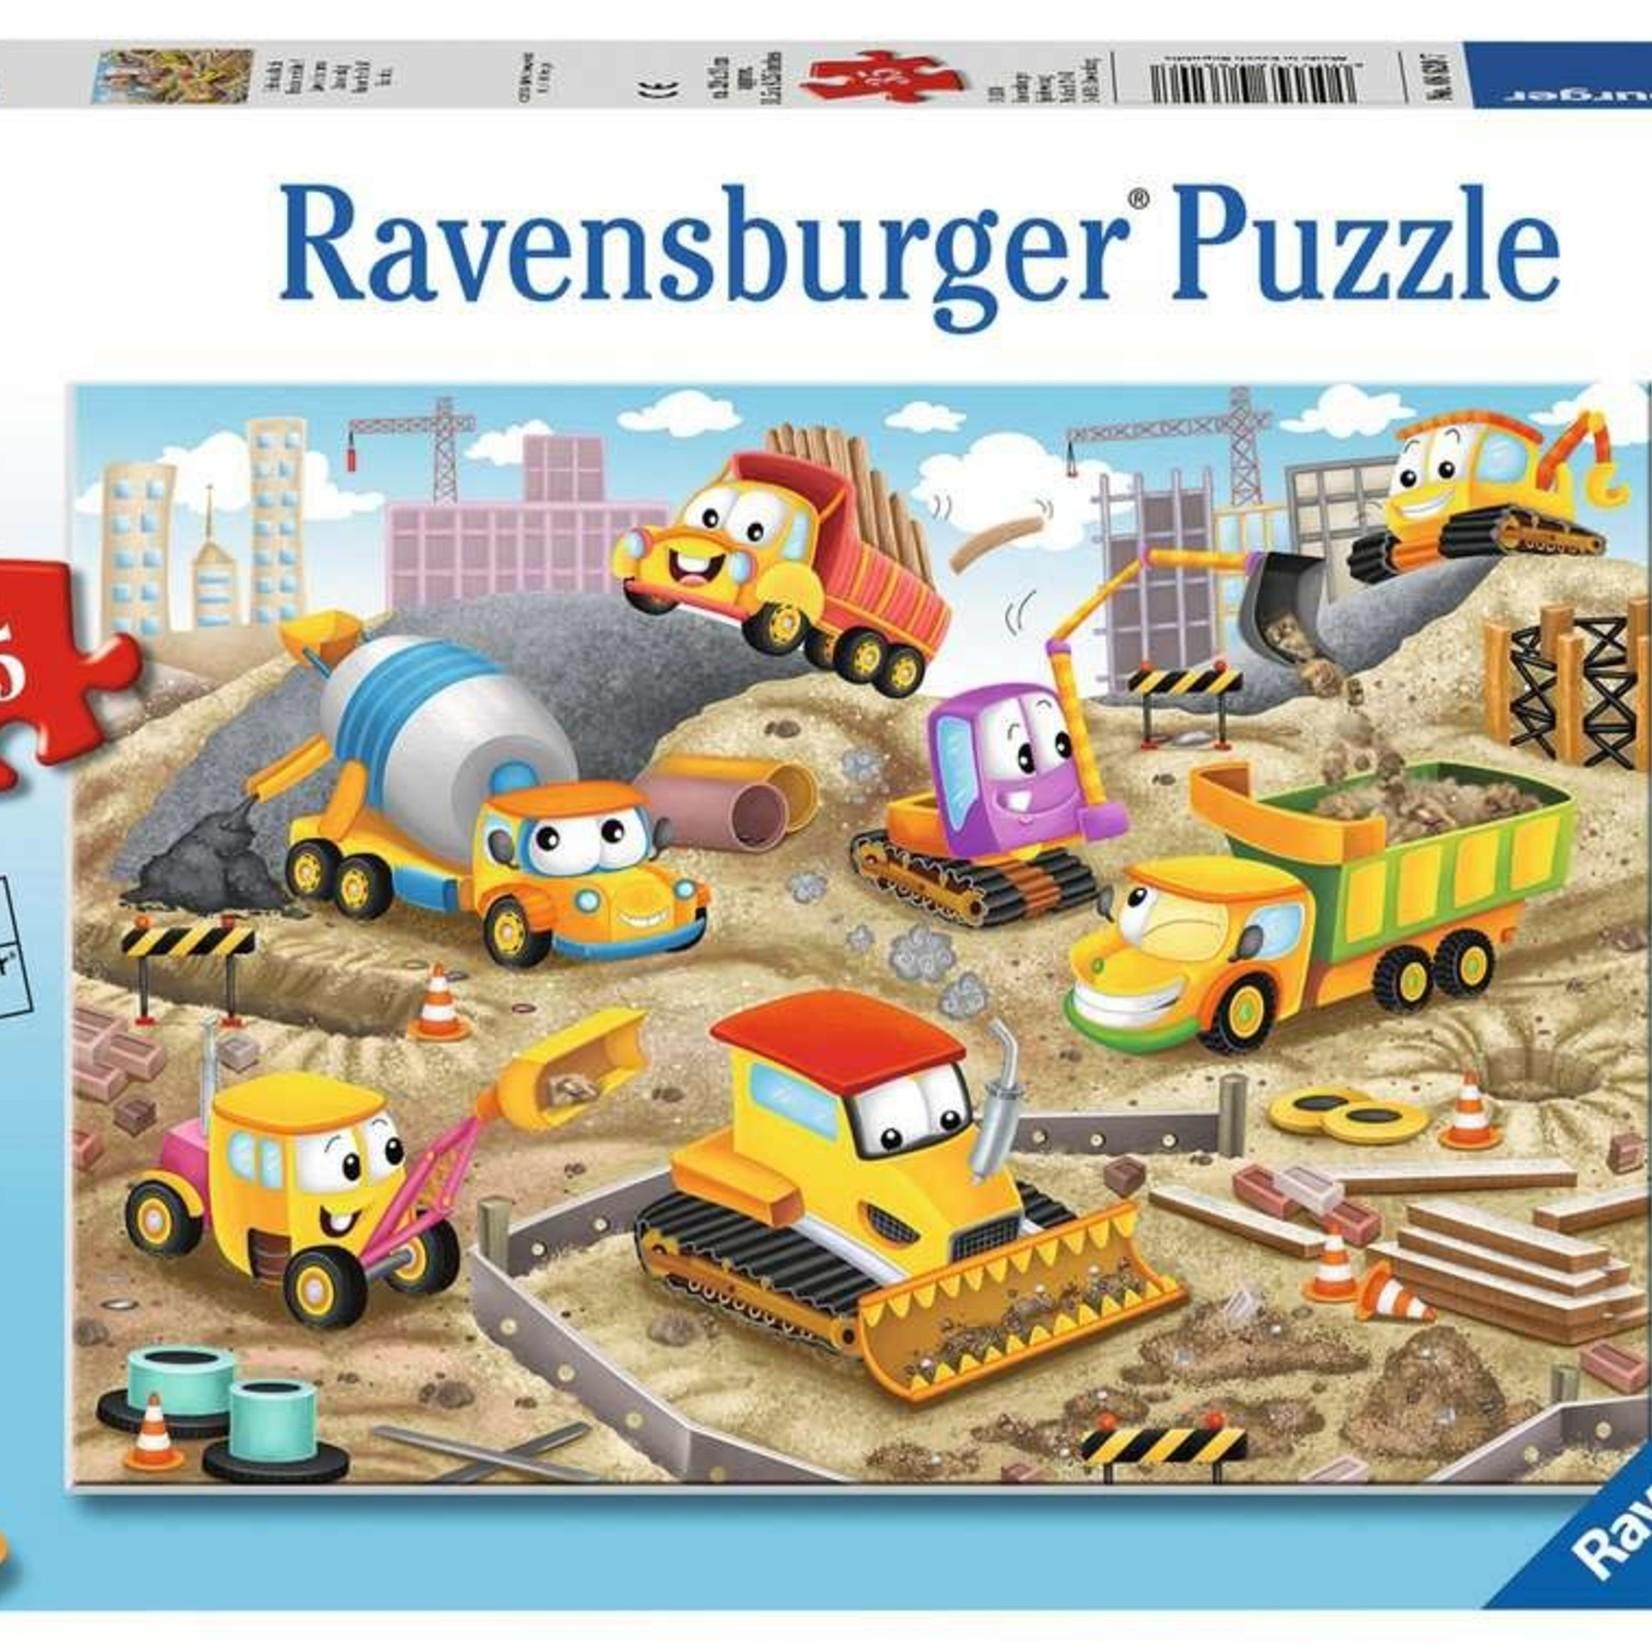 Ravensburger Raise the Roof - 35 pc